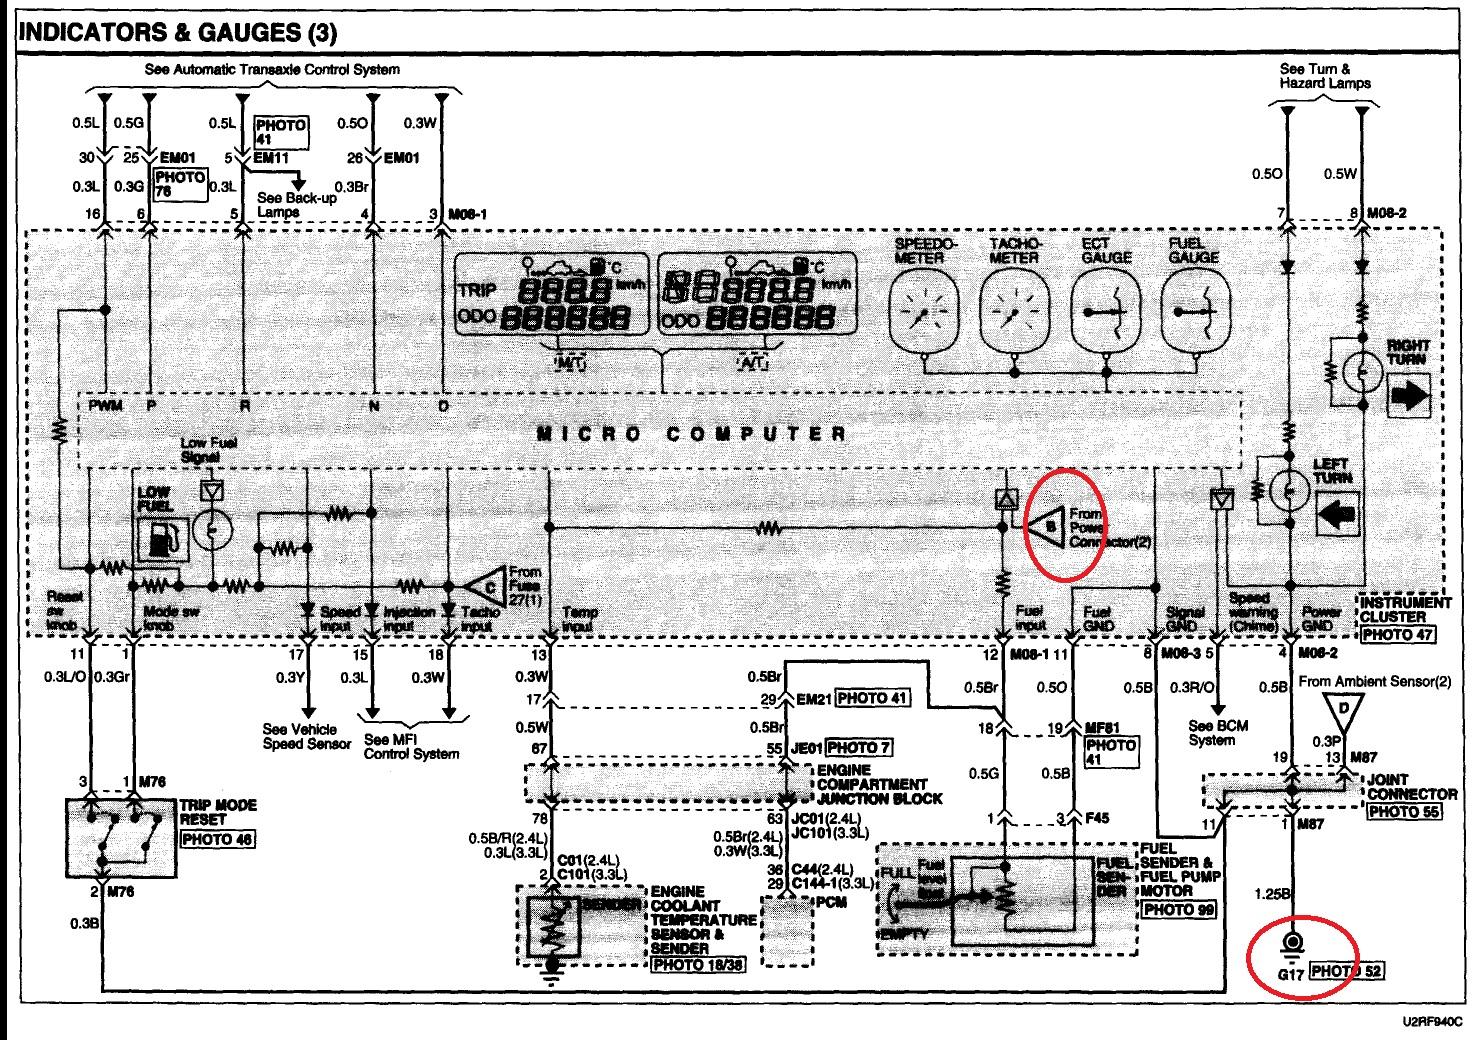 2009 Hyundai Accent Stereo Wiring Diagram : Hyundai accent wiring diagrams diagram